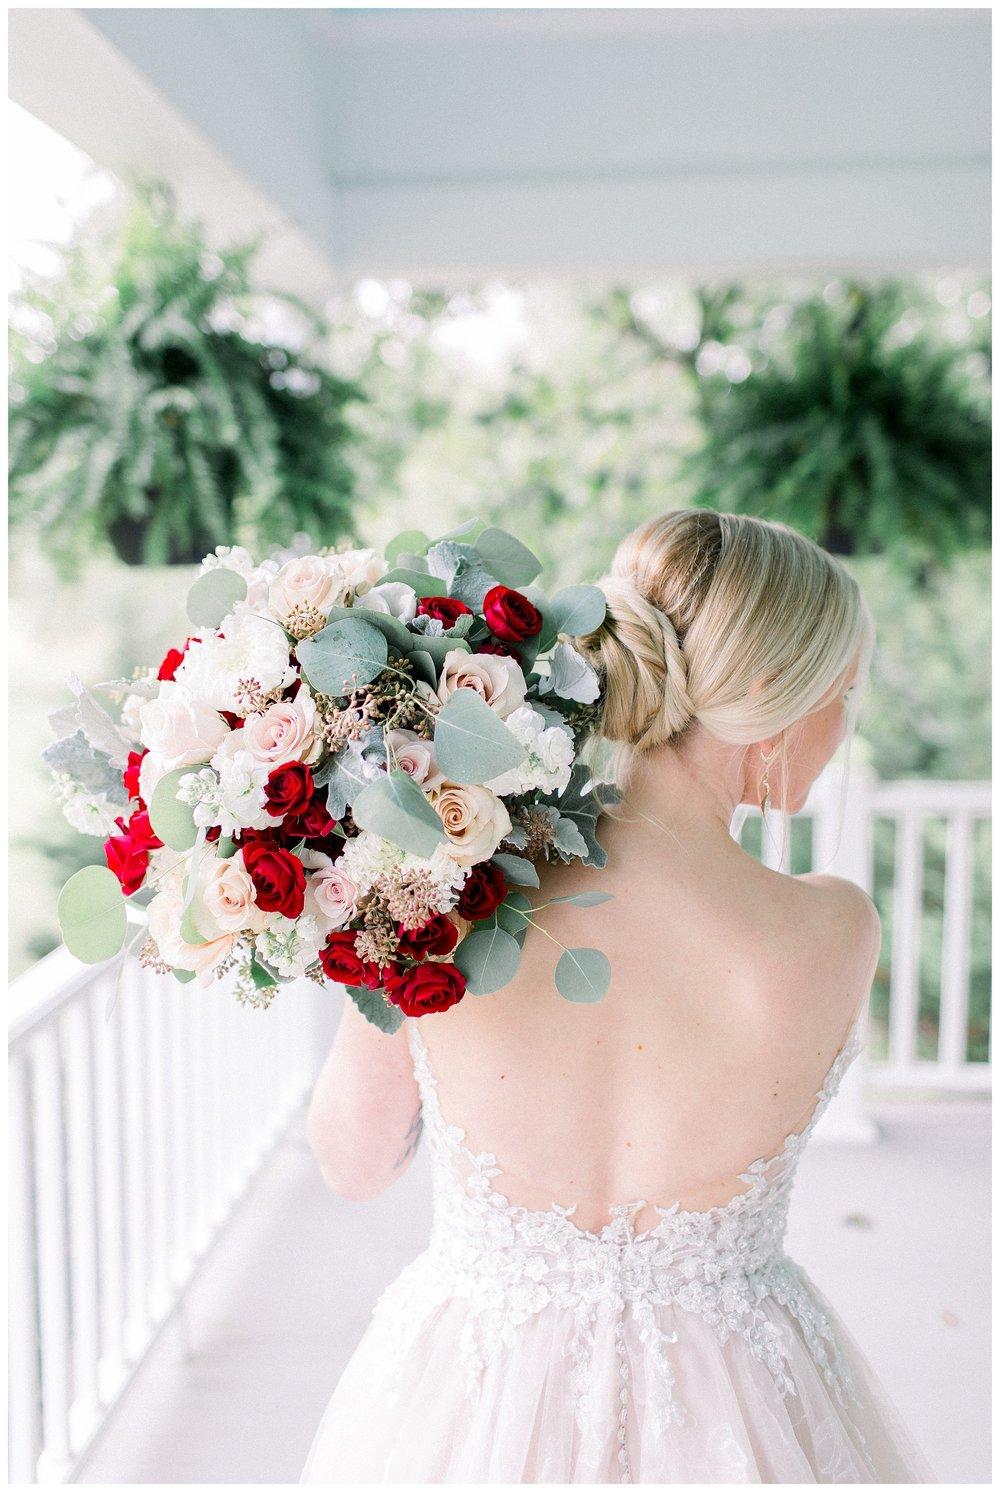 Whitehall Estate Wedding | Northern Virginia Wedding Photographer Kir Tuben_0040.jpg